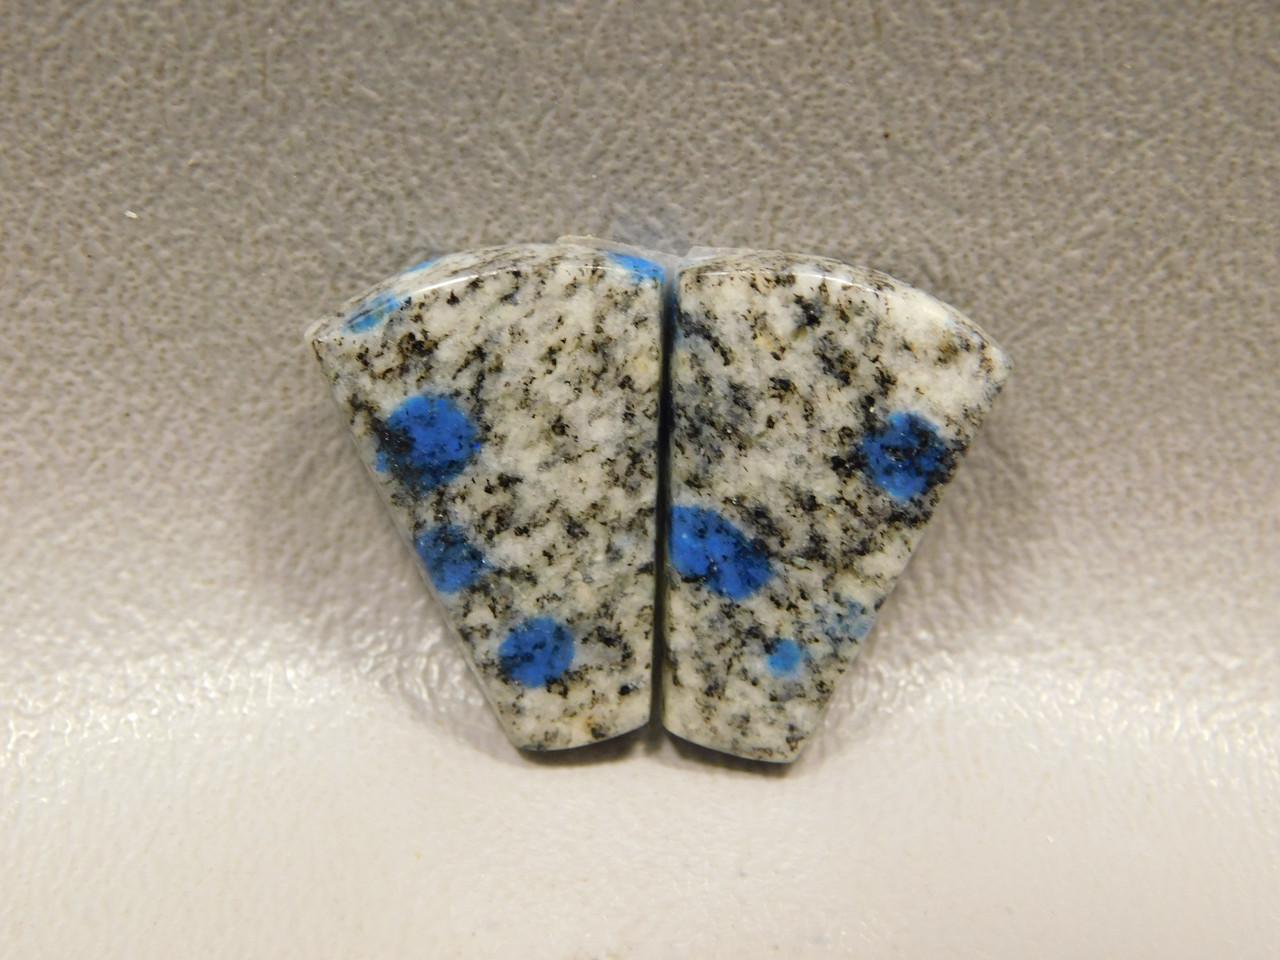 Cabochons K2 Azurite Jasper Matched Pair Gemstone 5